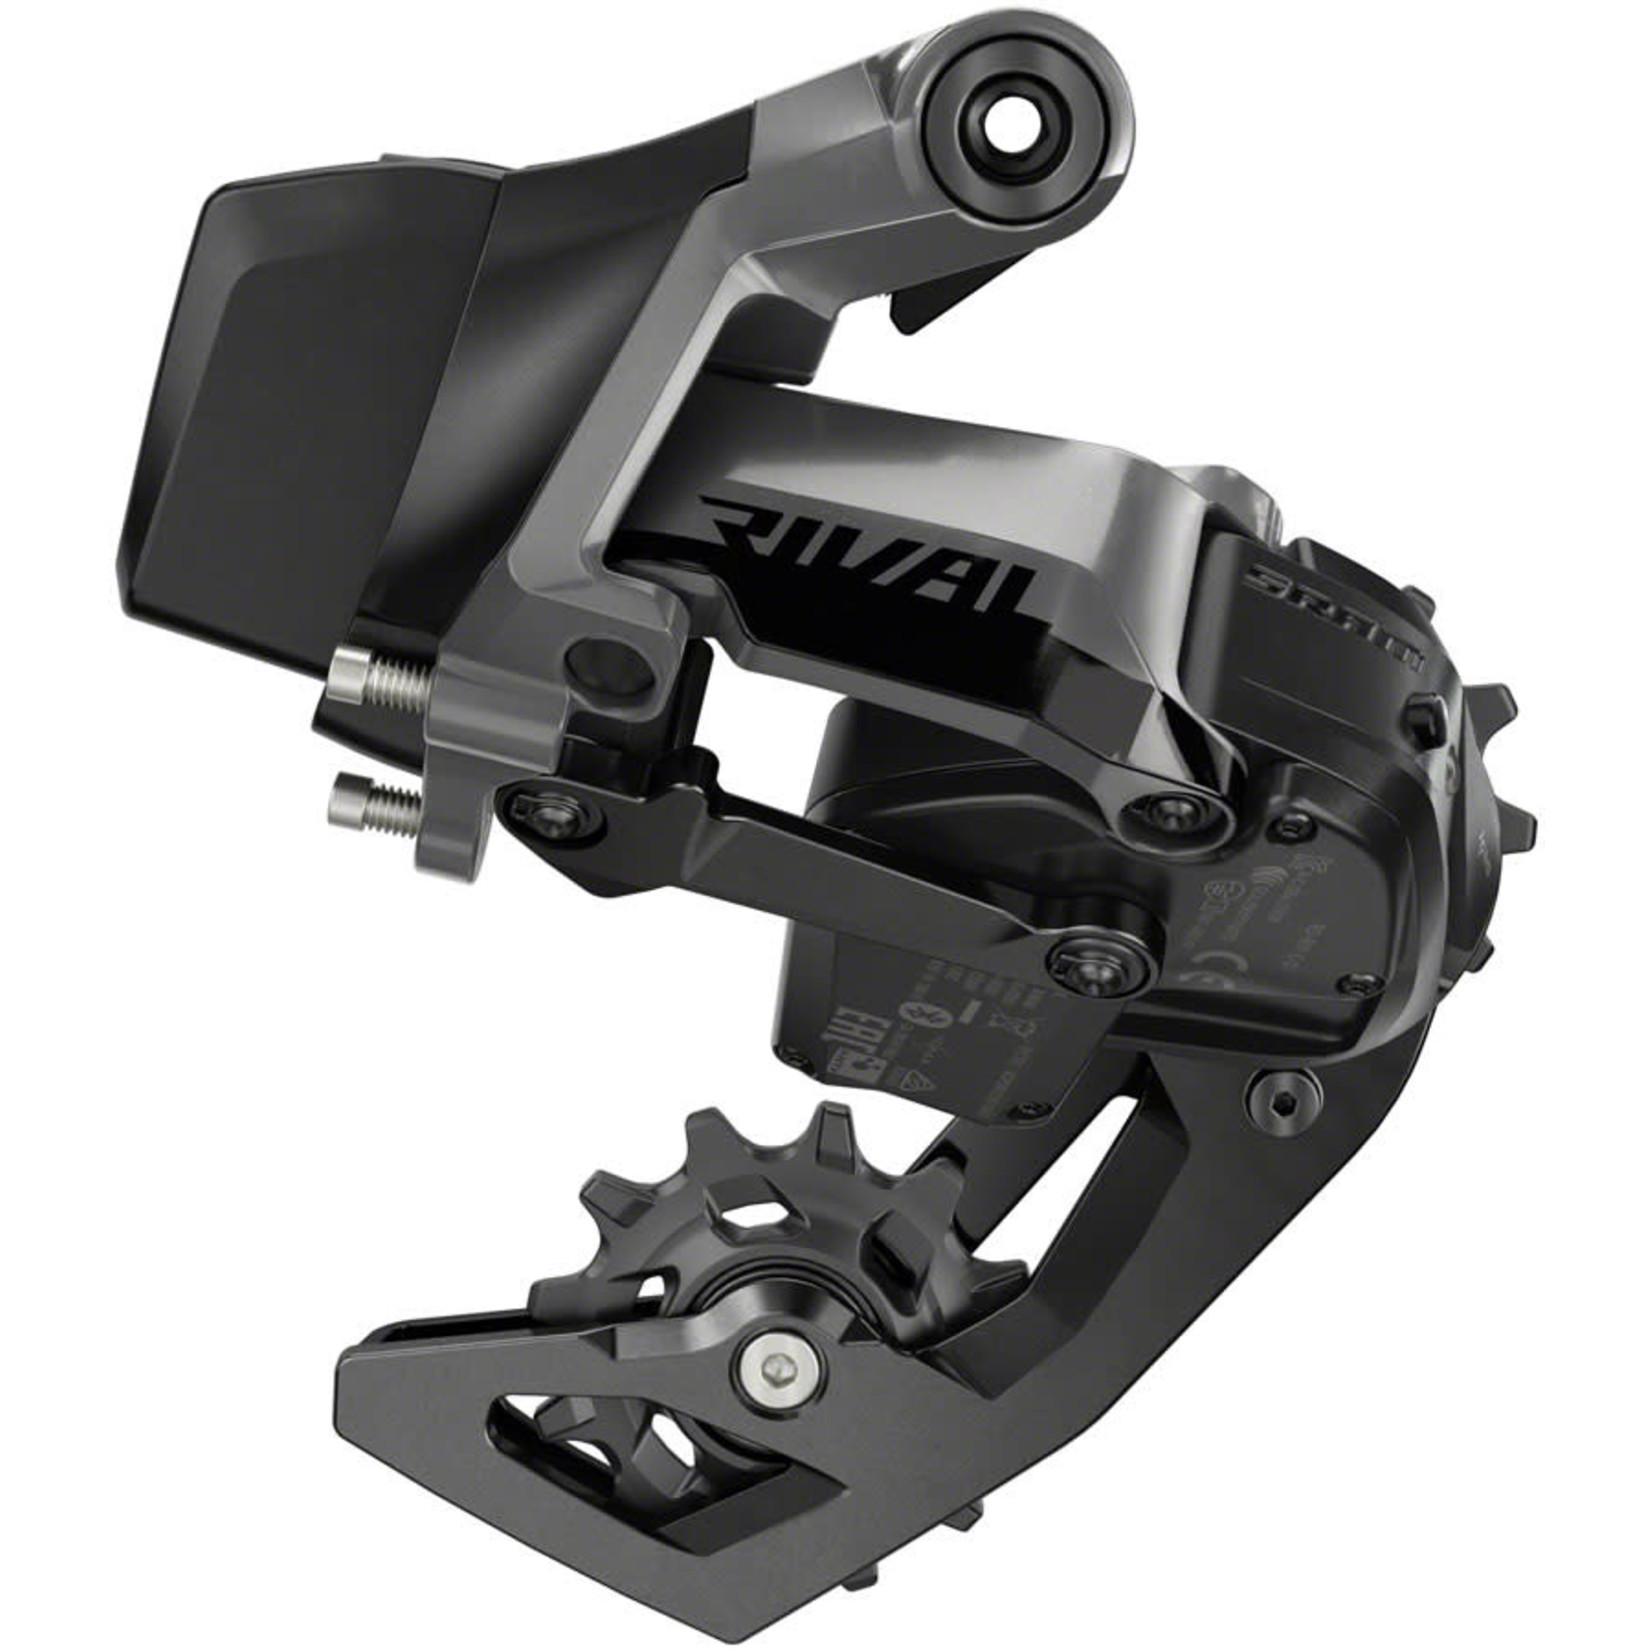 SRAM SRAM Rival eTap AXS Rear Derailleur - 12-Speed - Medium Cage - D1